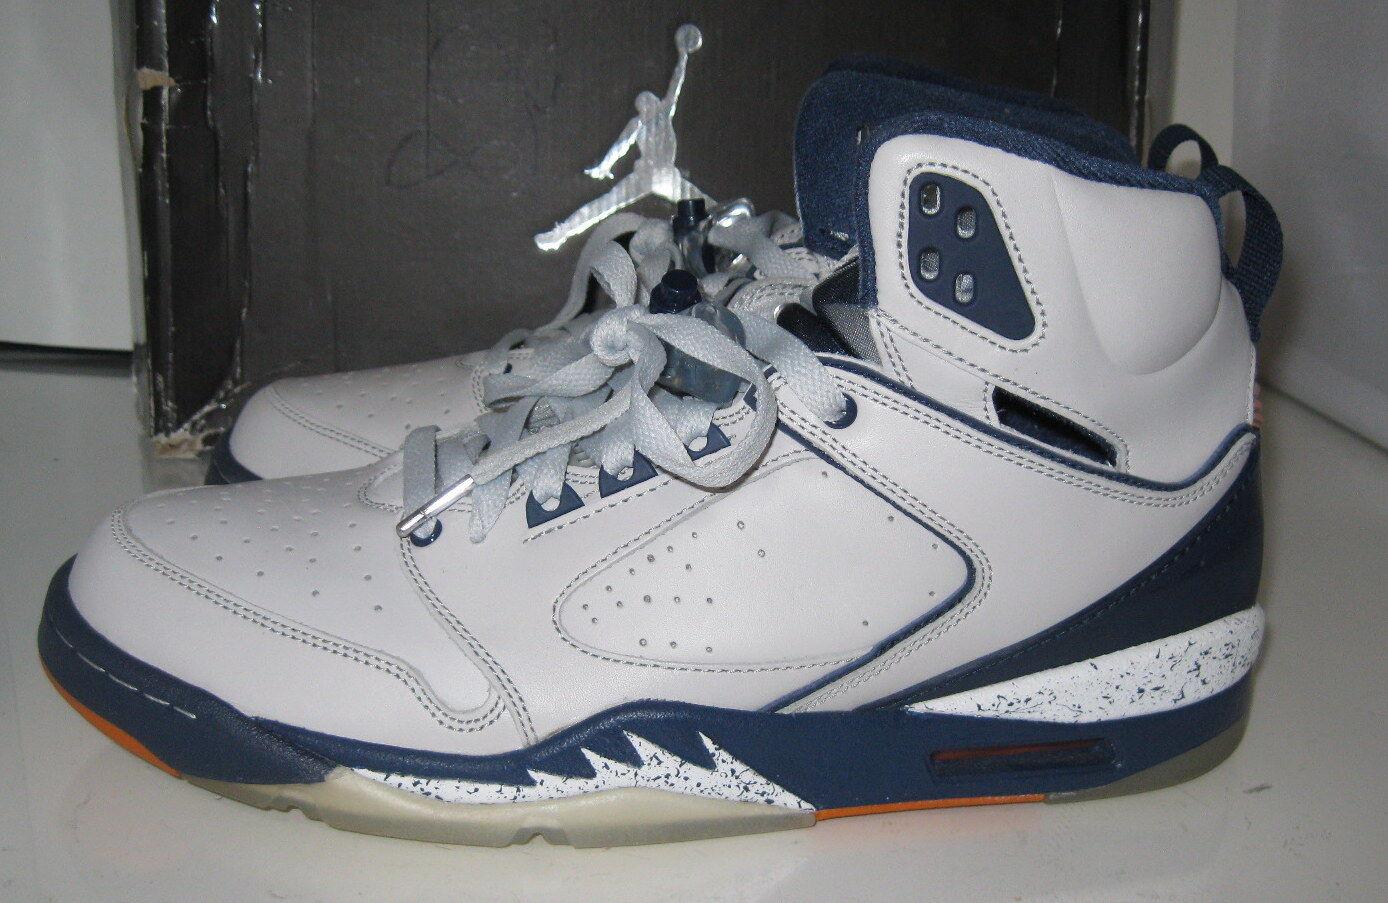 Nike Jordan Sixty Plus 60+ Cleveland Cavaliersneutral Grey/Crmc-Mdnght Size 11.5 Scarpe classiche da uomo